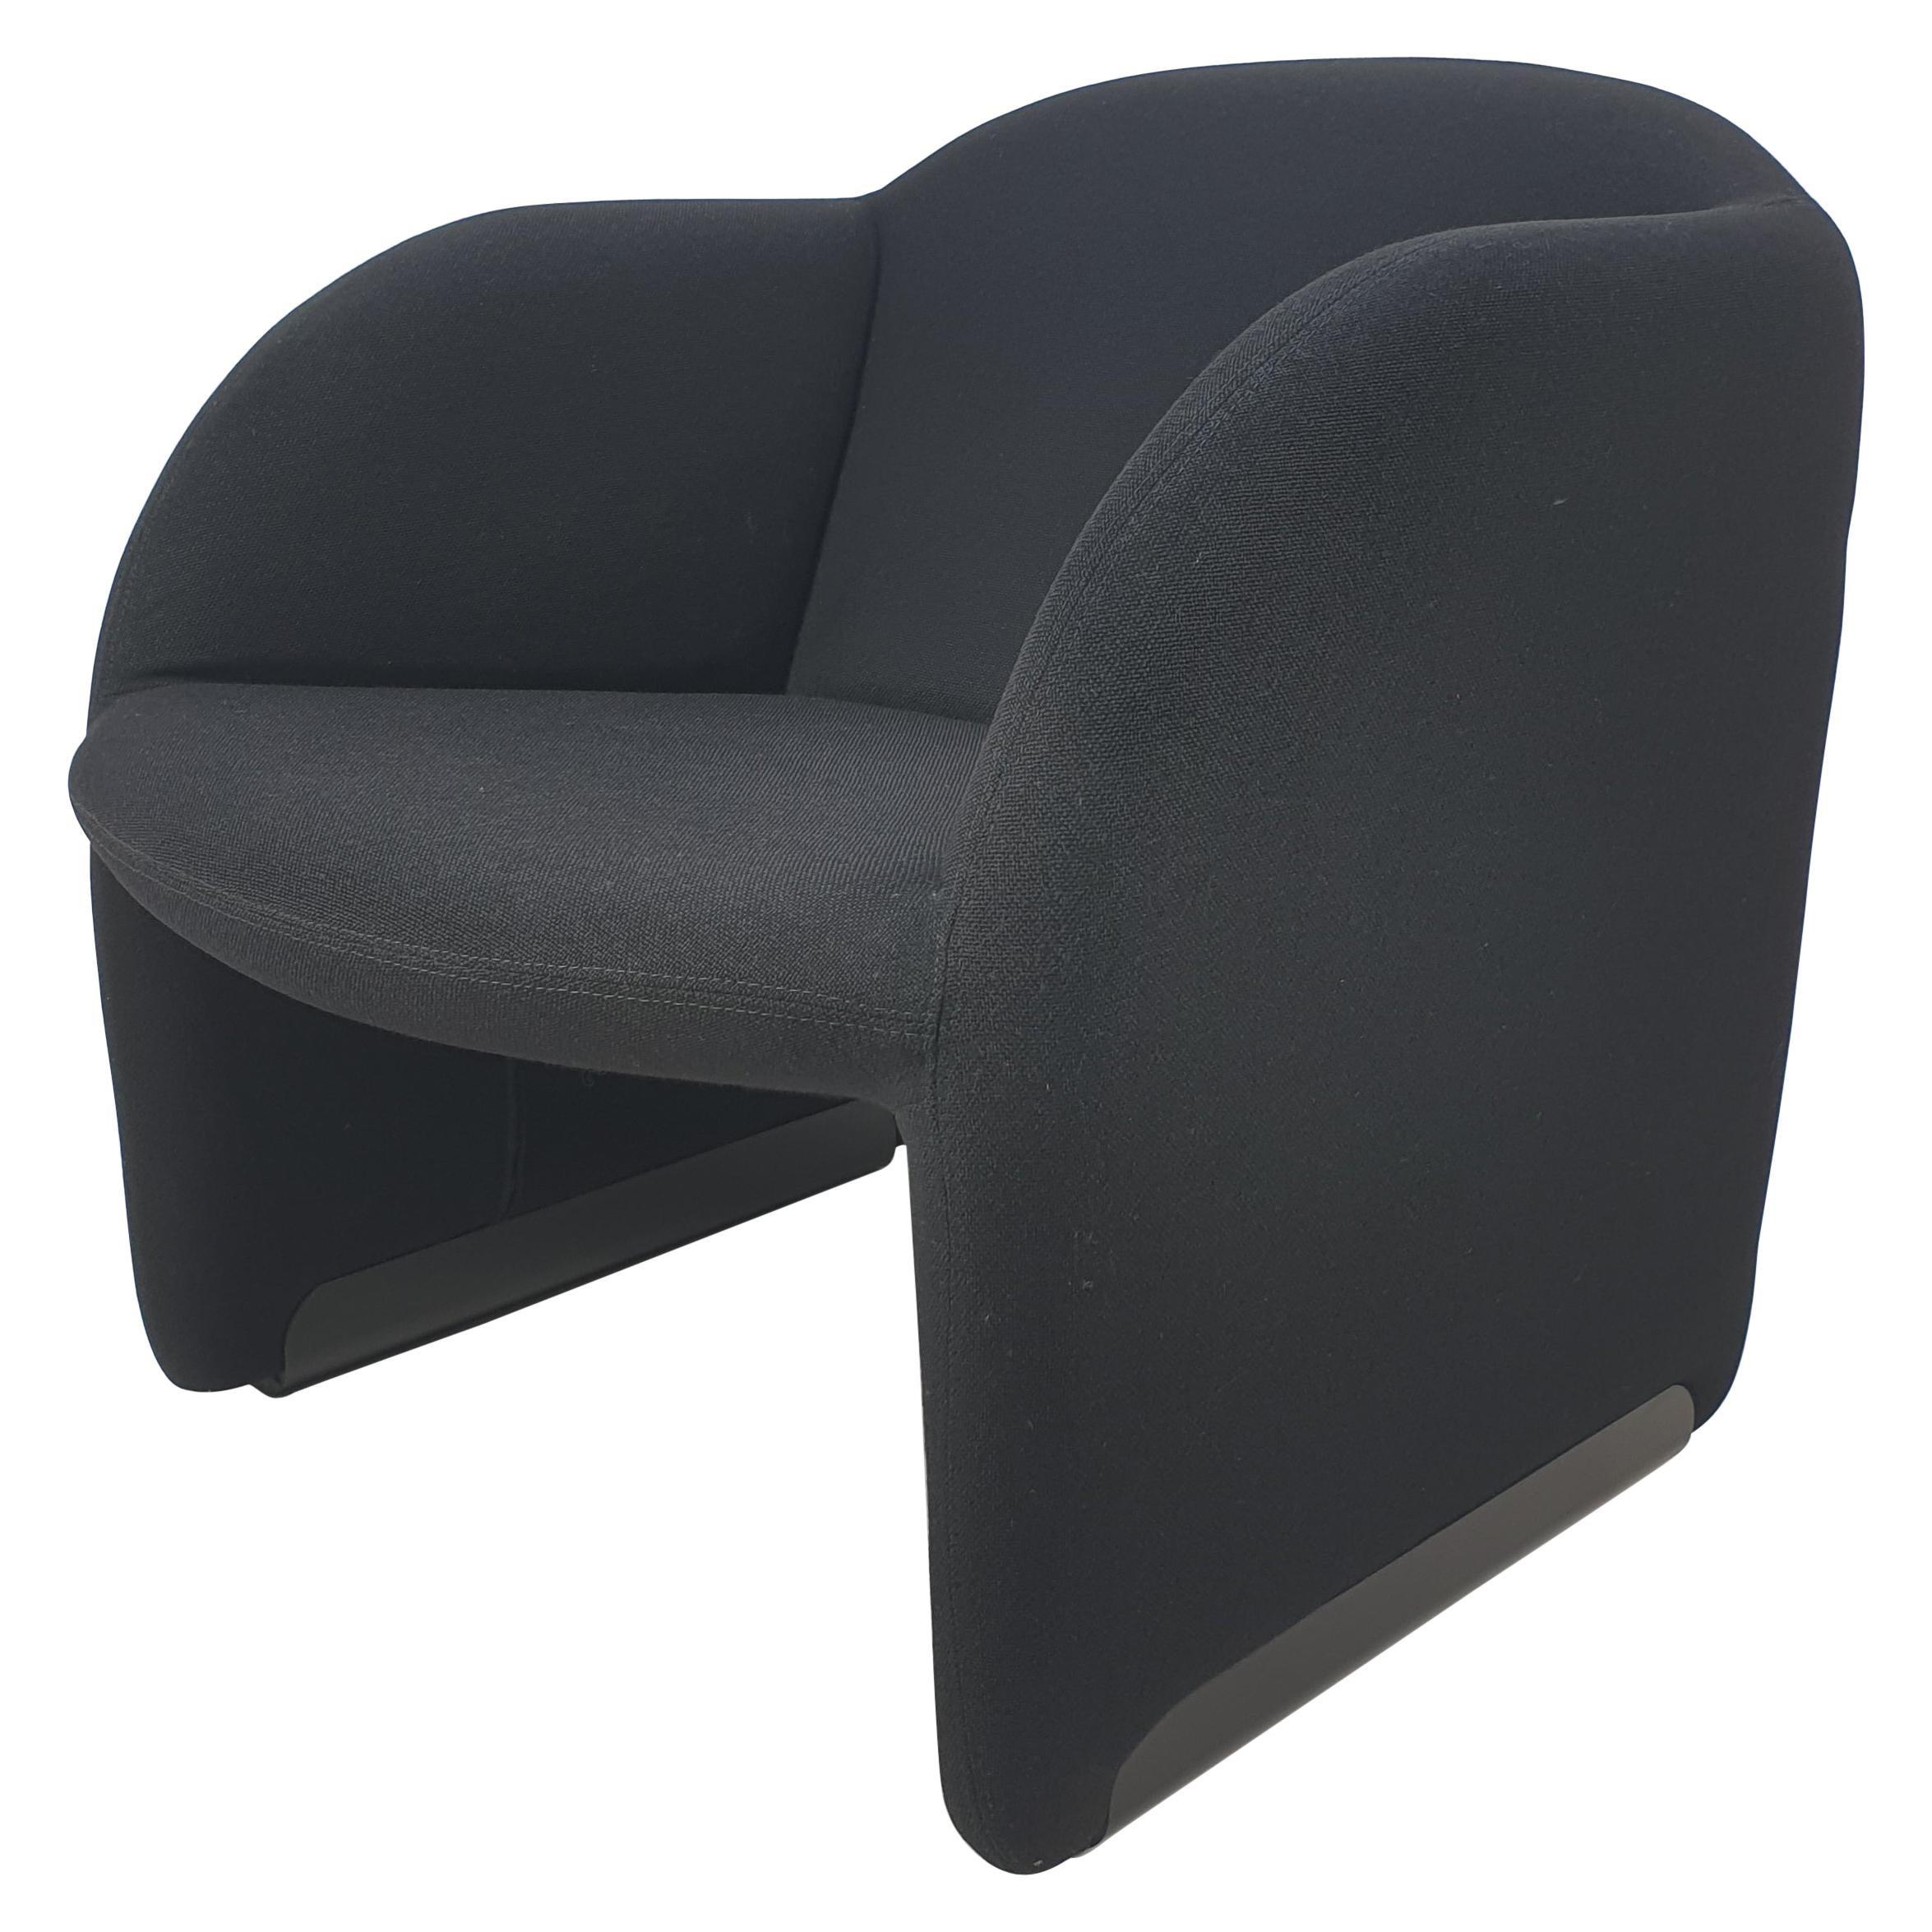 Ben Chair by Pierre Paulin for Artifort, 1980s